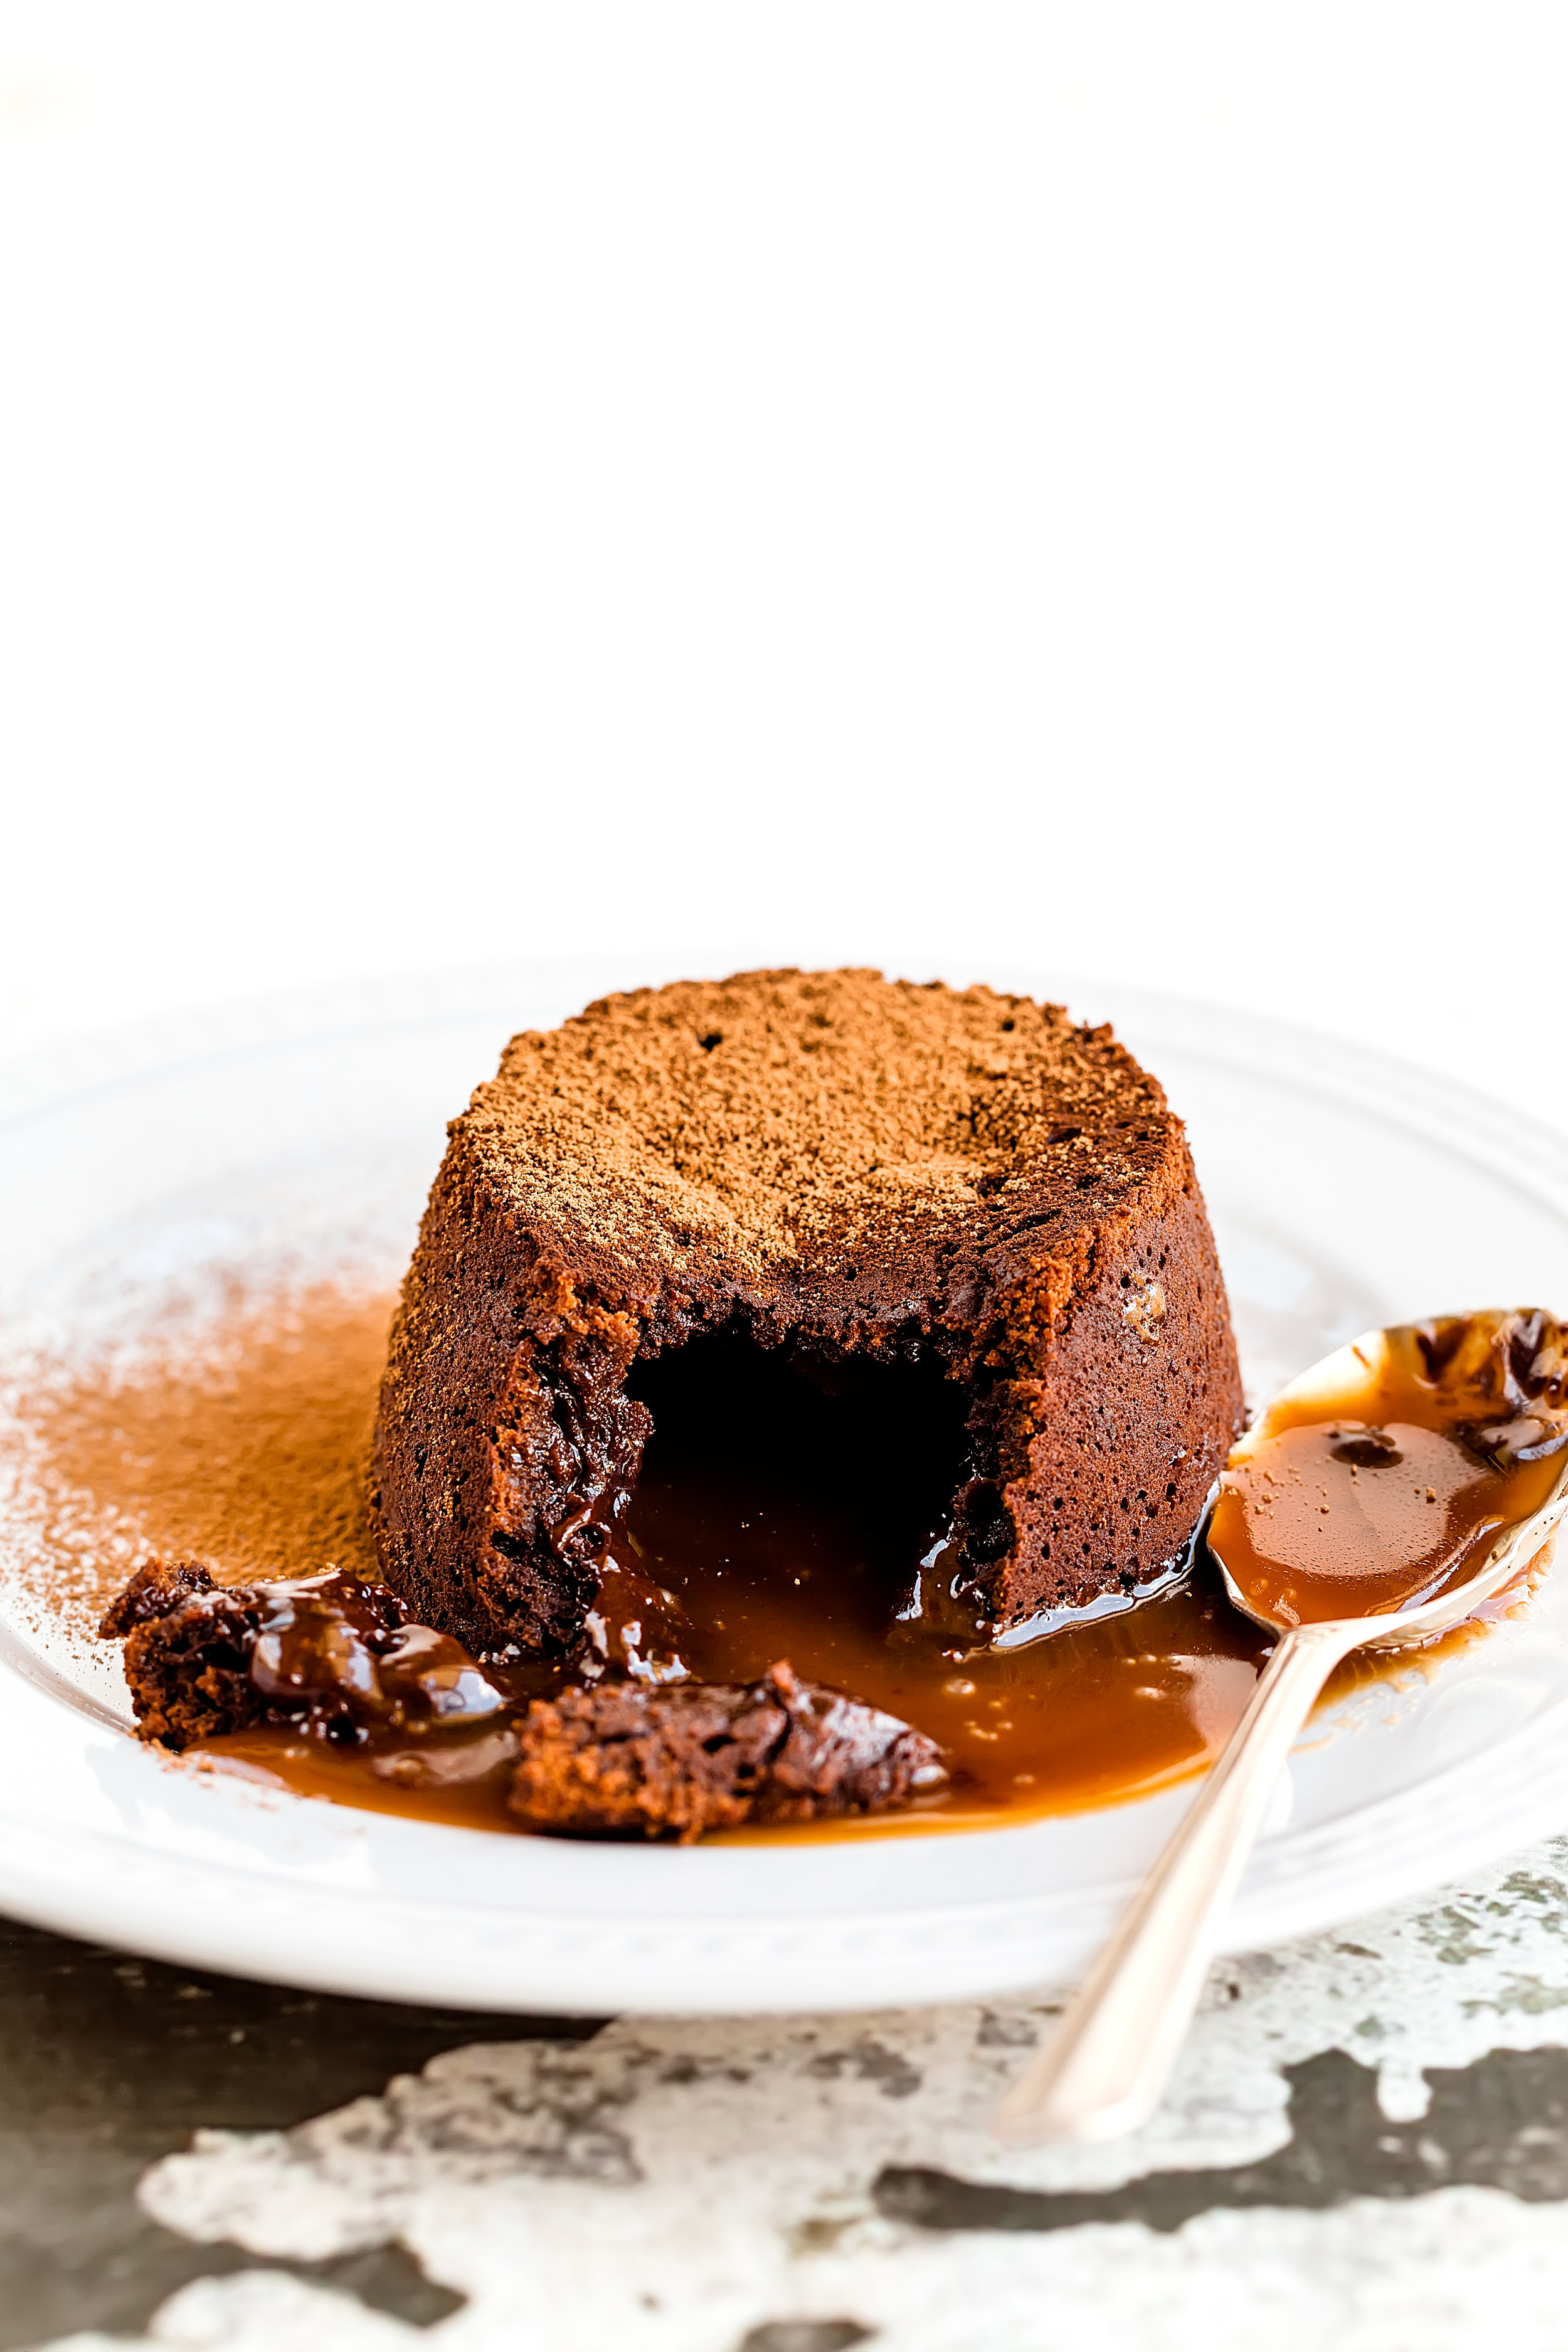 Sticky-toffee-pudding-007.jpg